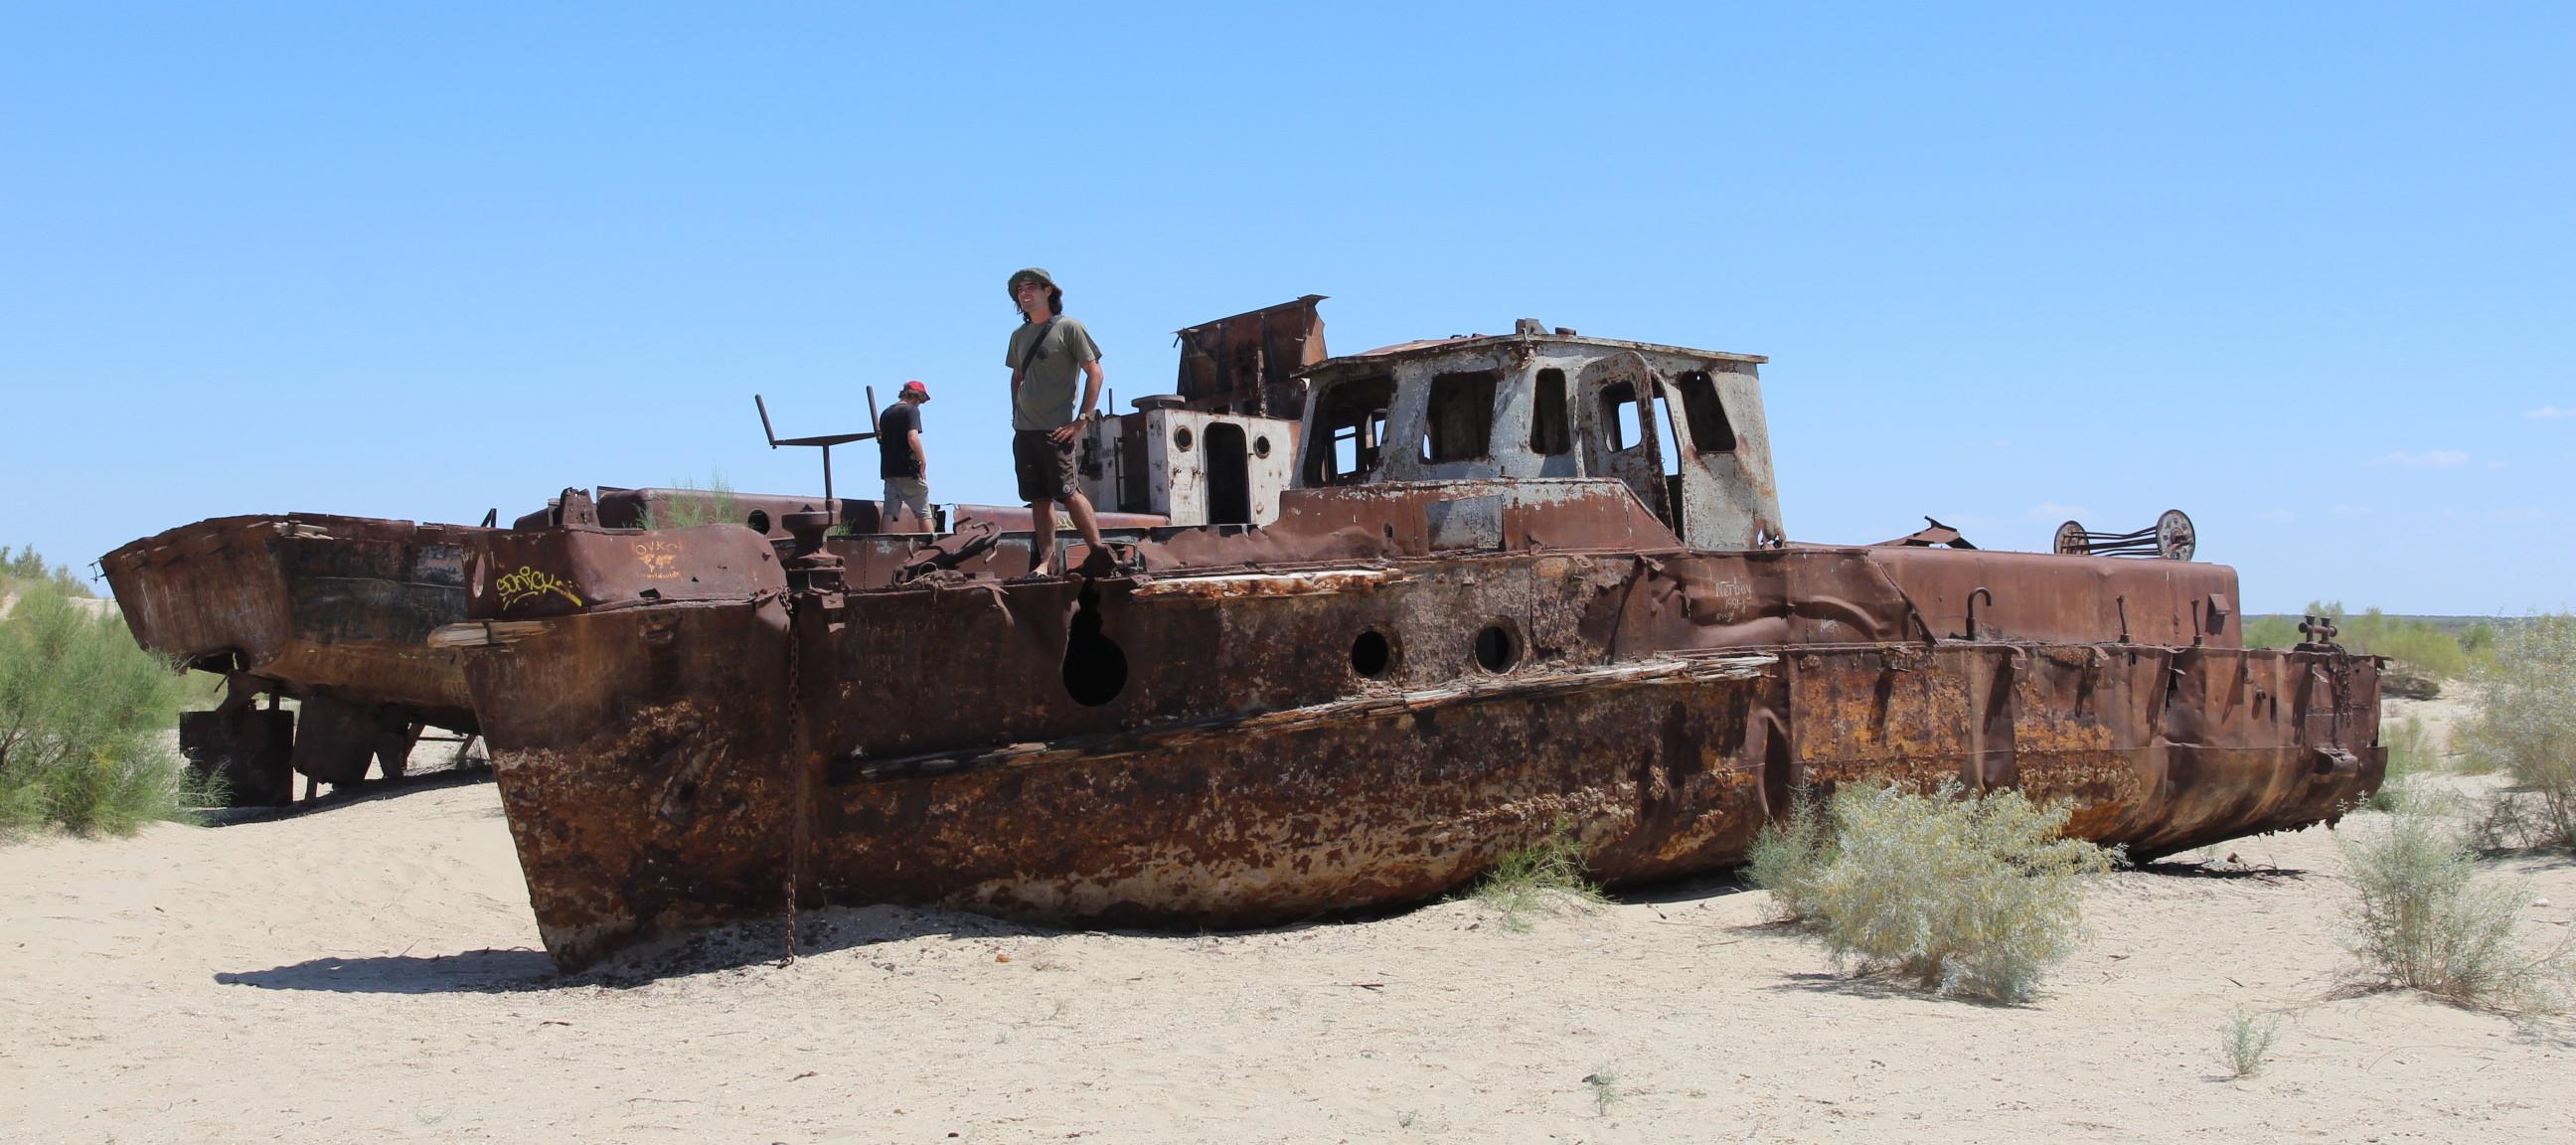 Ships Of The Dessert  Ghost ships in the desert—the heartbreak of the Aral Sea